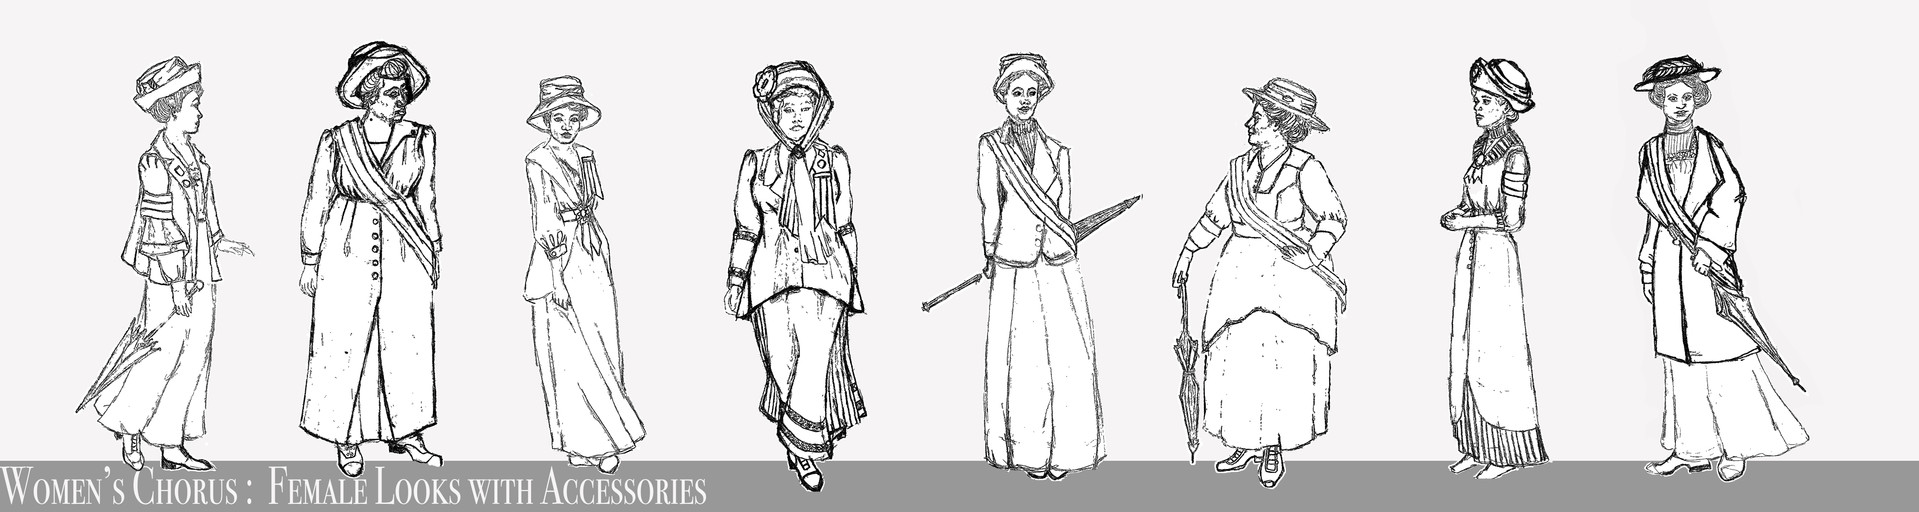 Women's Chorus Female Looks w/Hats & Sashes